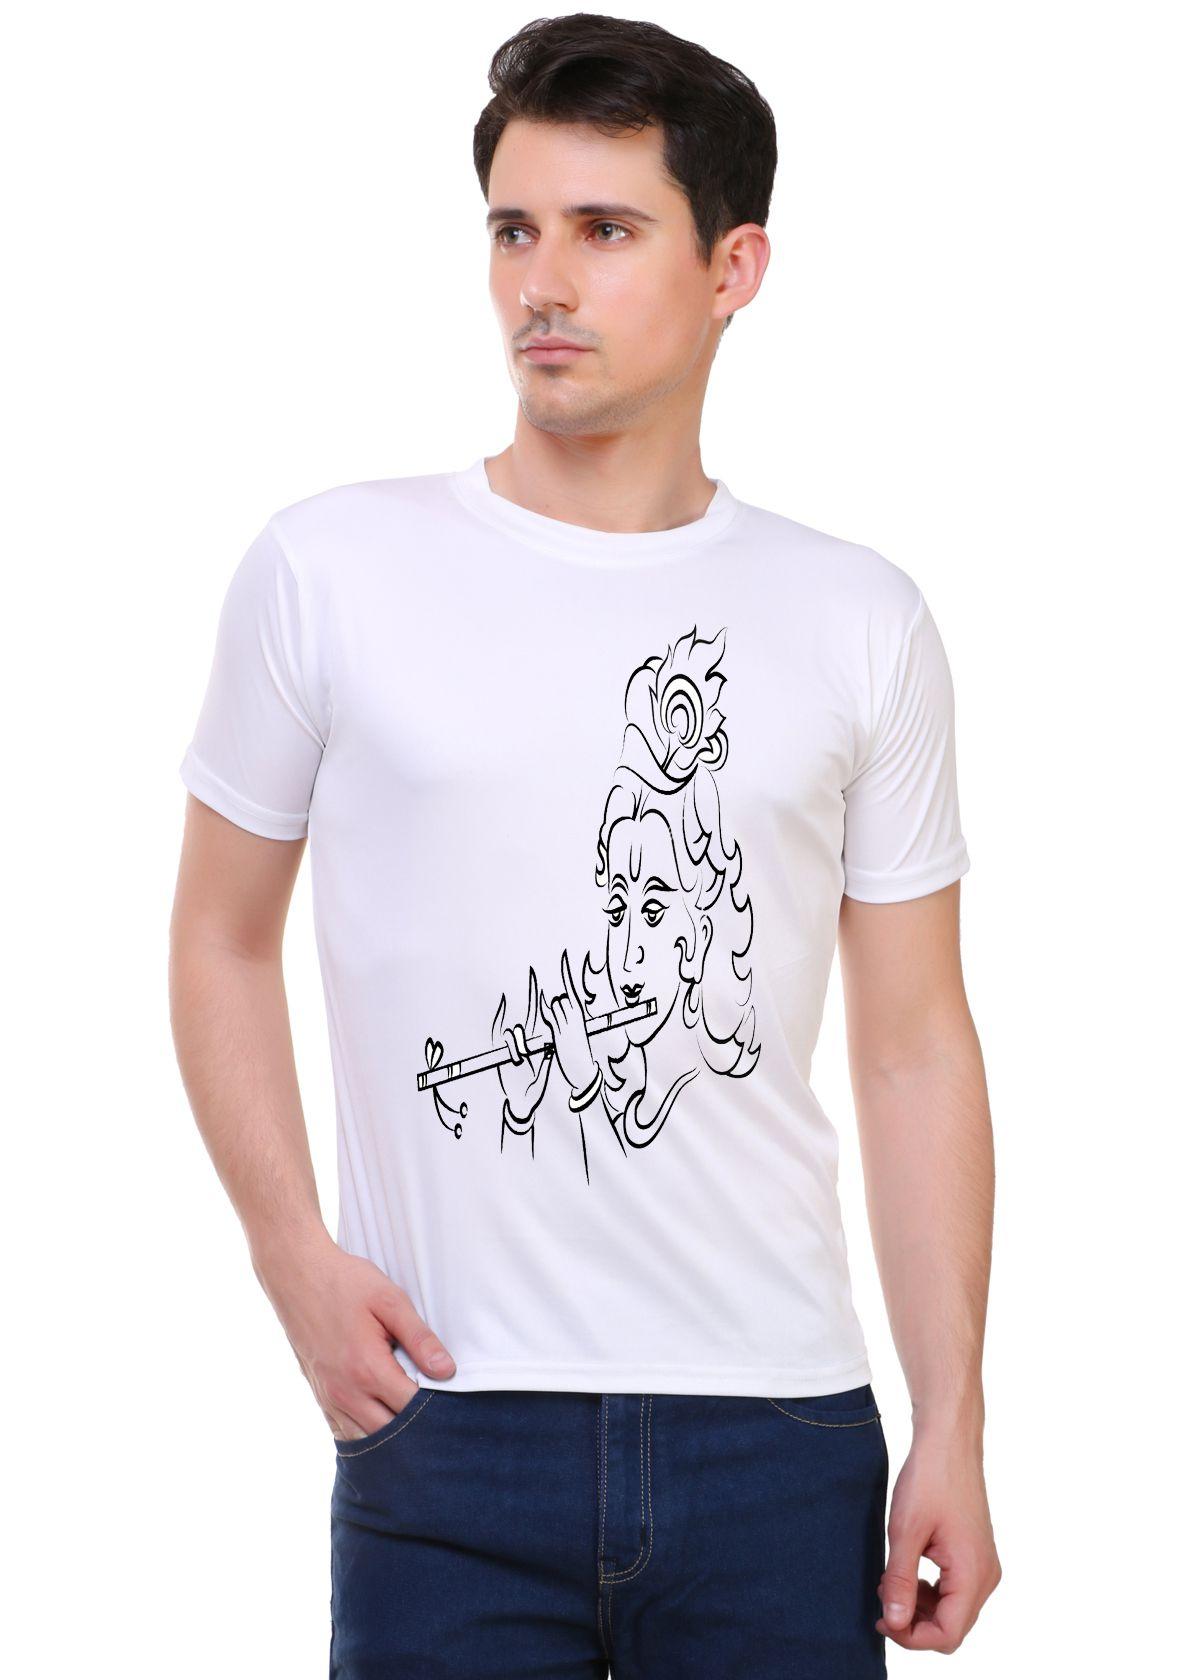 M R MARC ROSE White Round T-Shirt